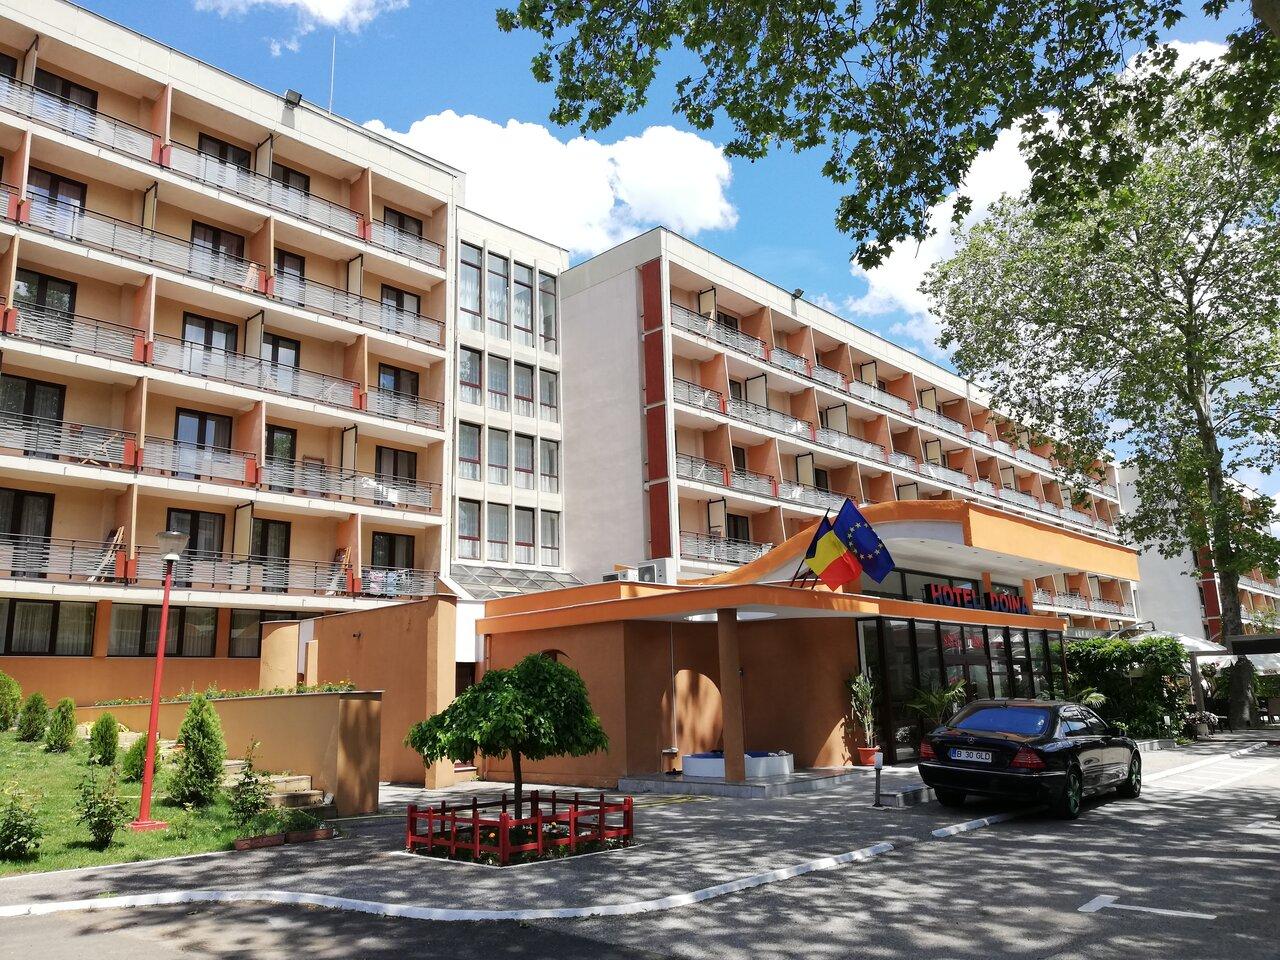 Hotel Doina - Oferta Paste